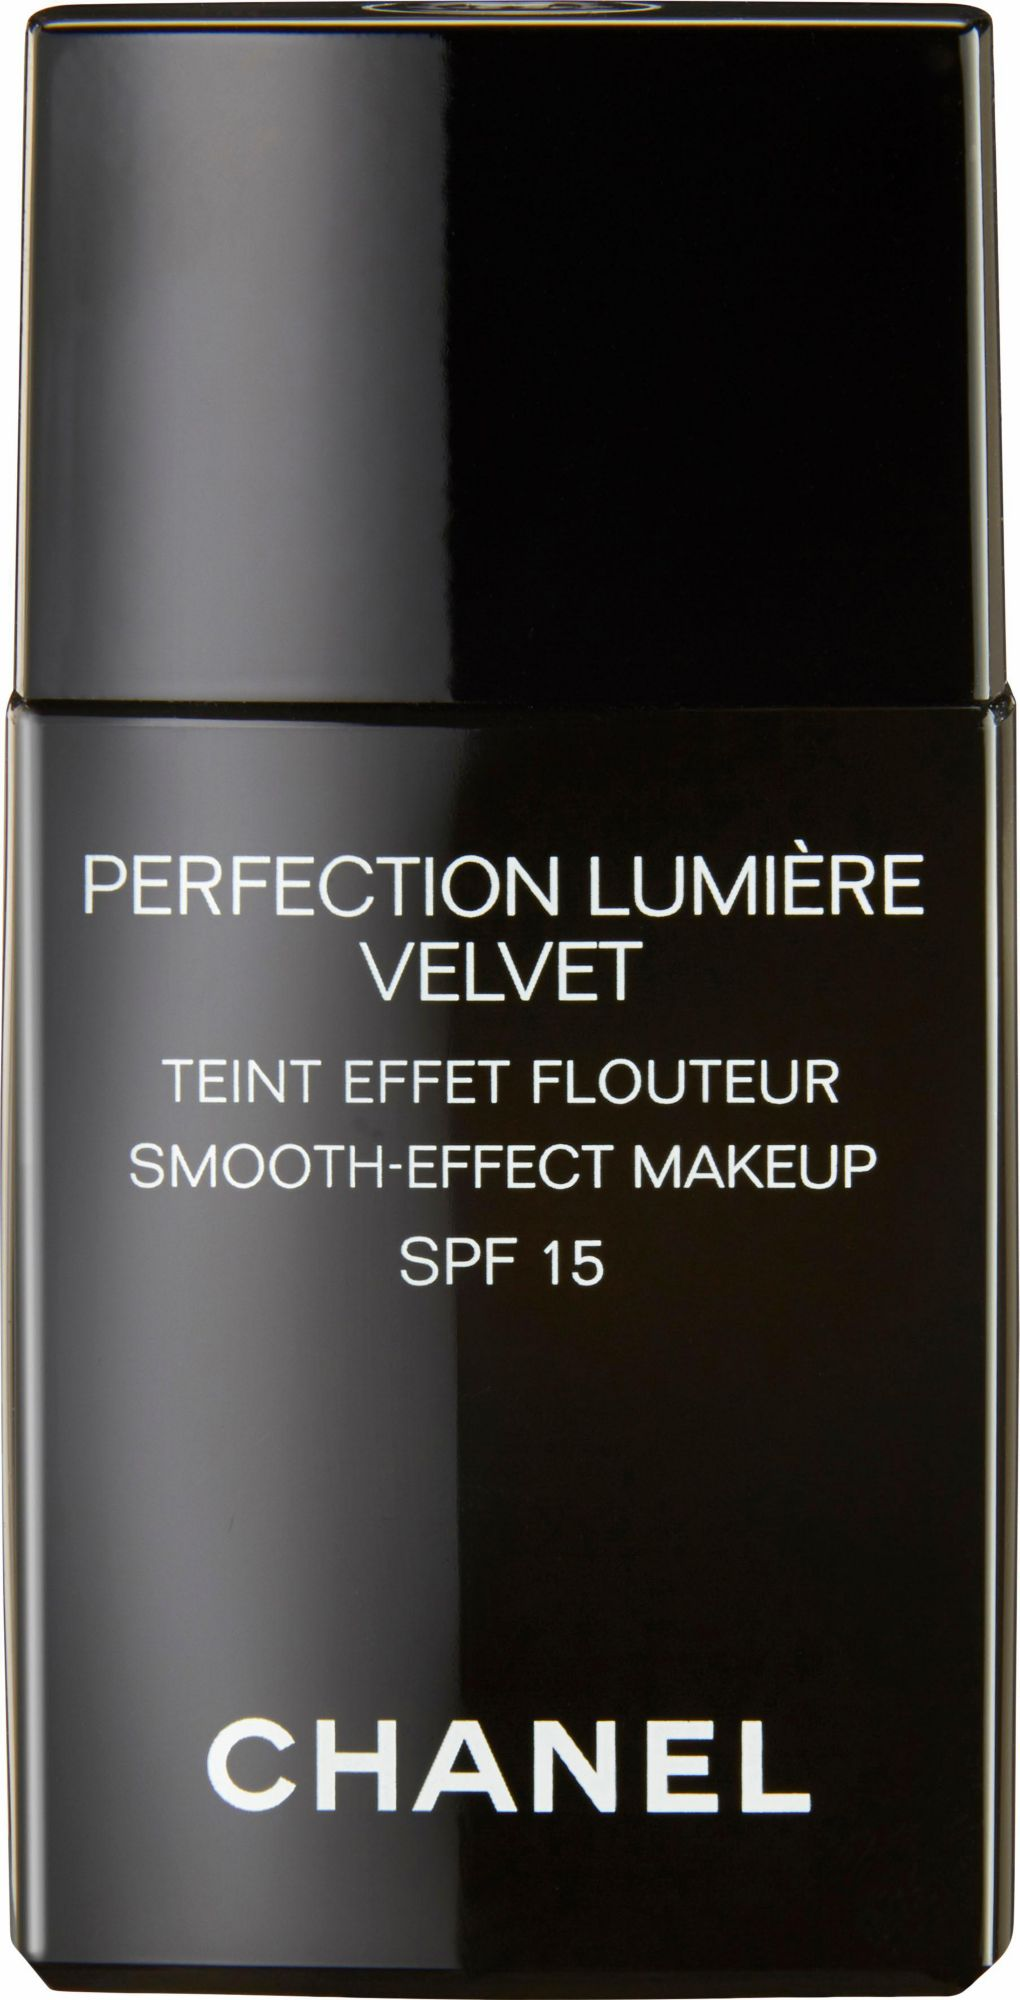 CHANEL Chanel, »Perfection Lumière Velvet«, Fluid-Make-up